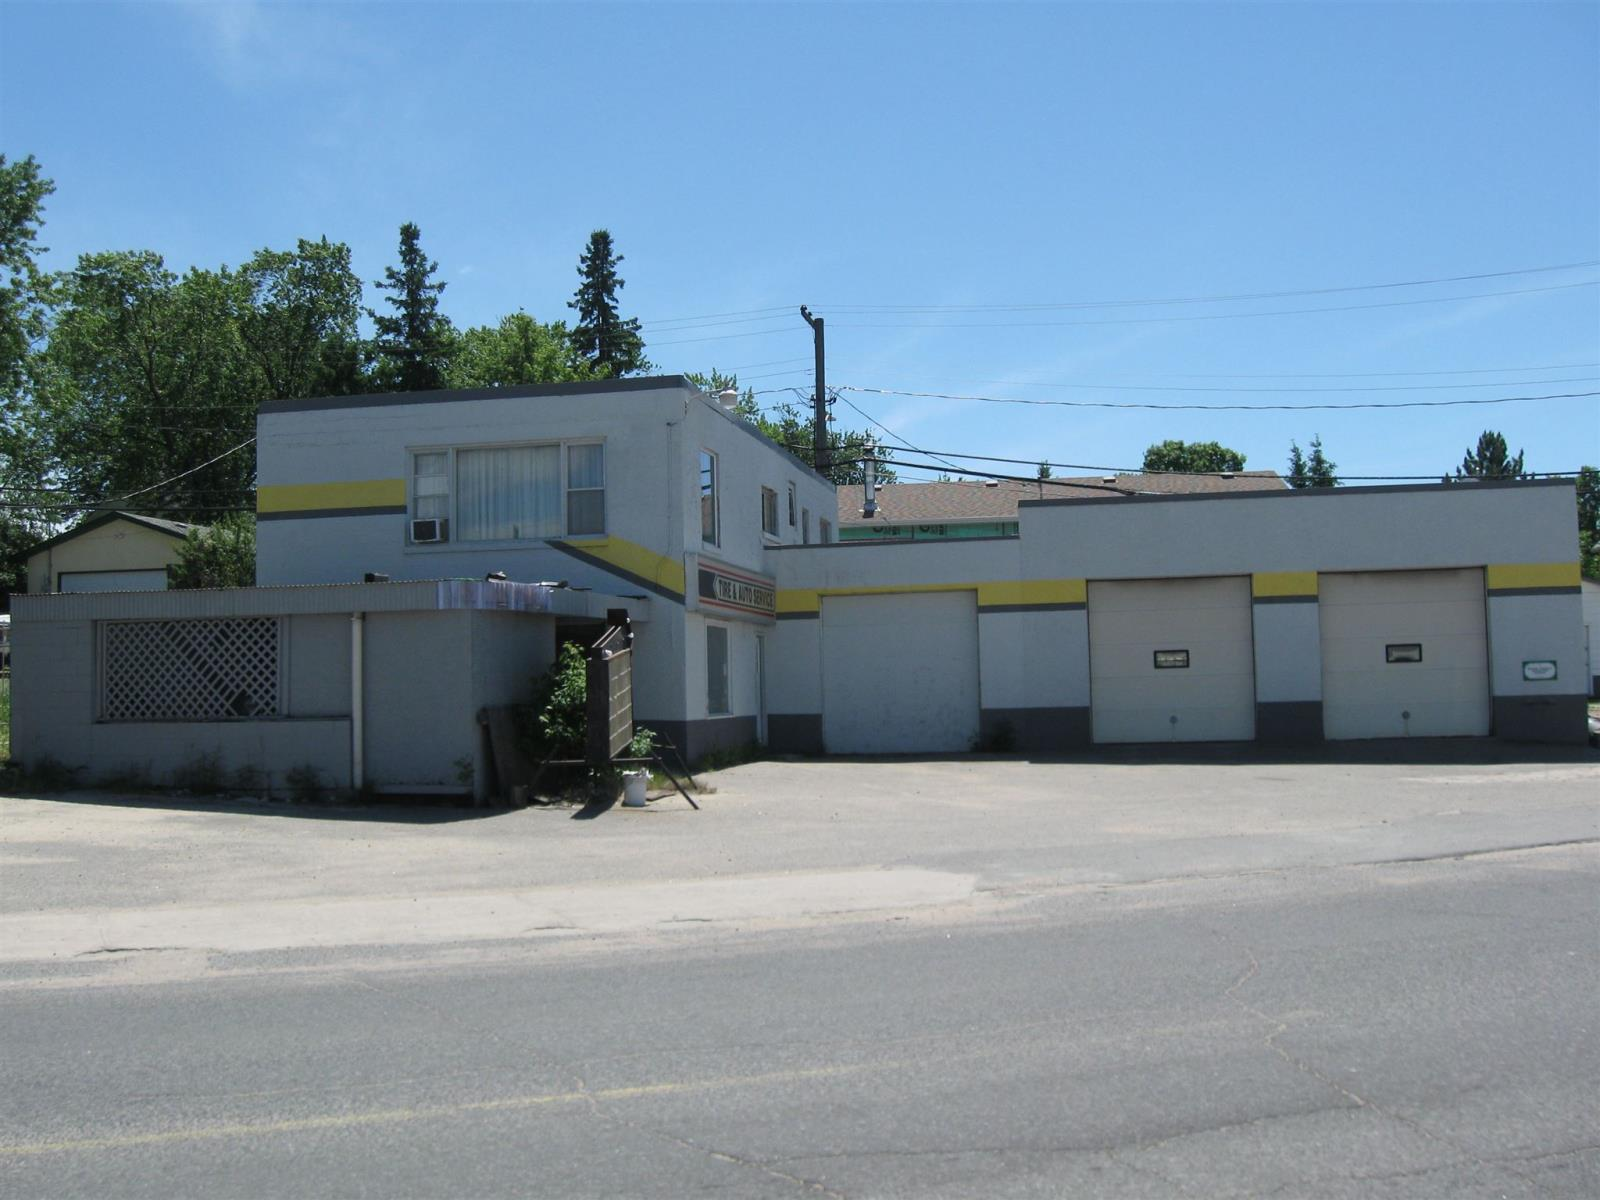 525 Park St, Kenora, Ontario  P9N 1A3 - Photo 1 - TB181394